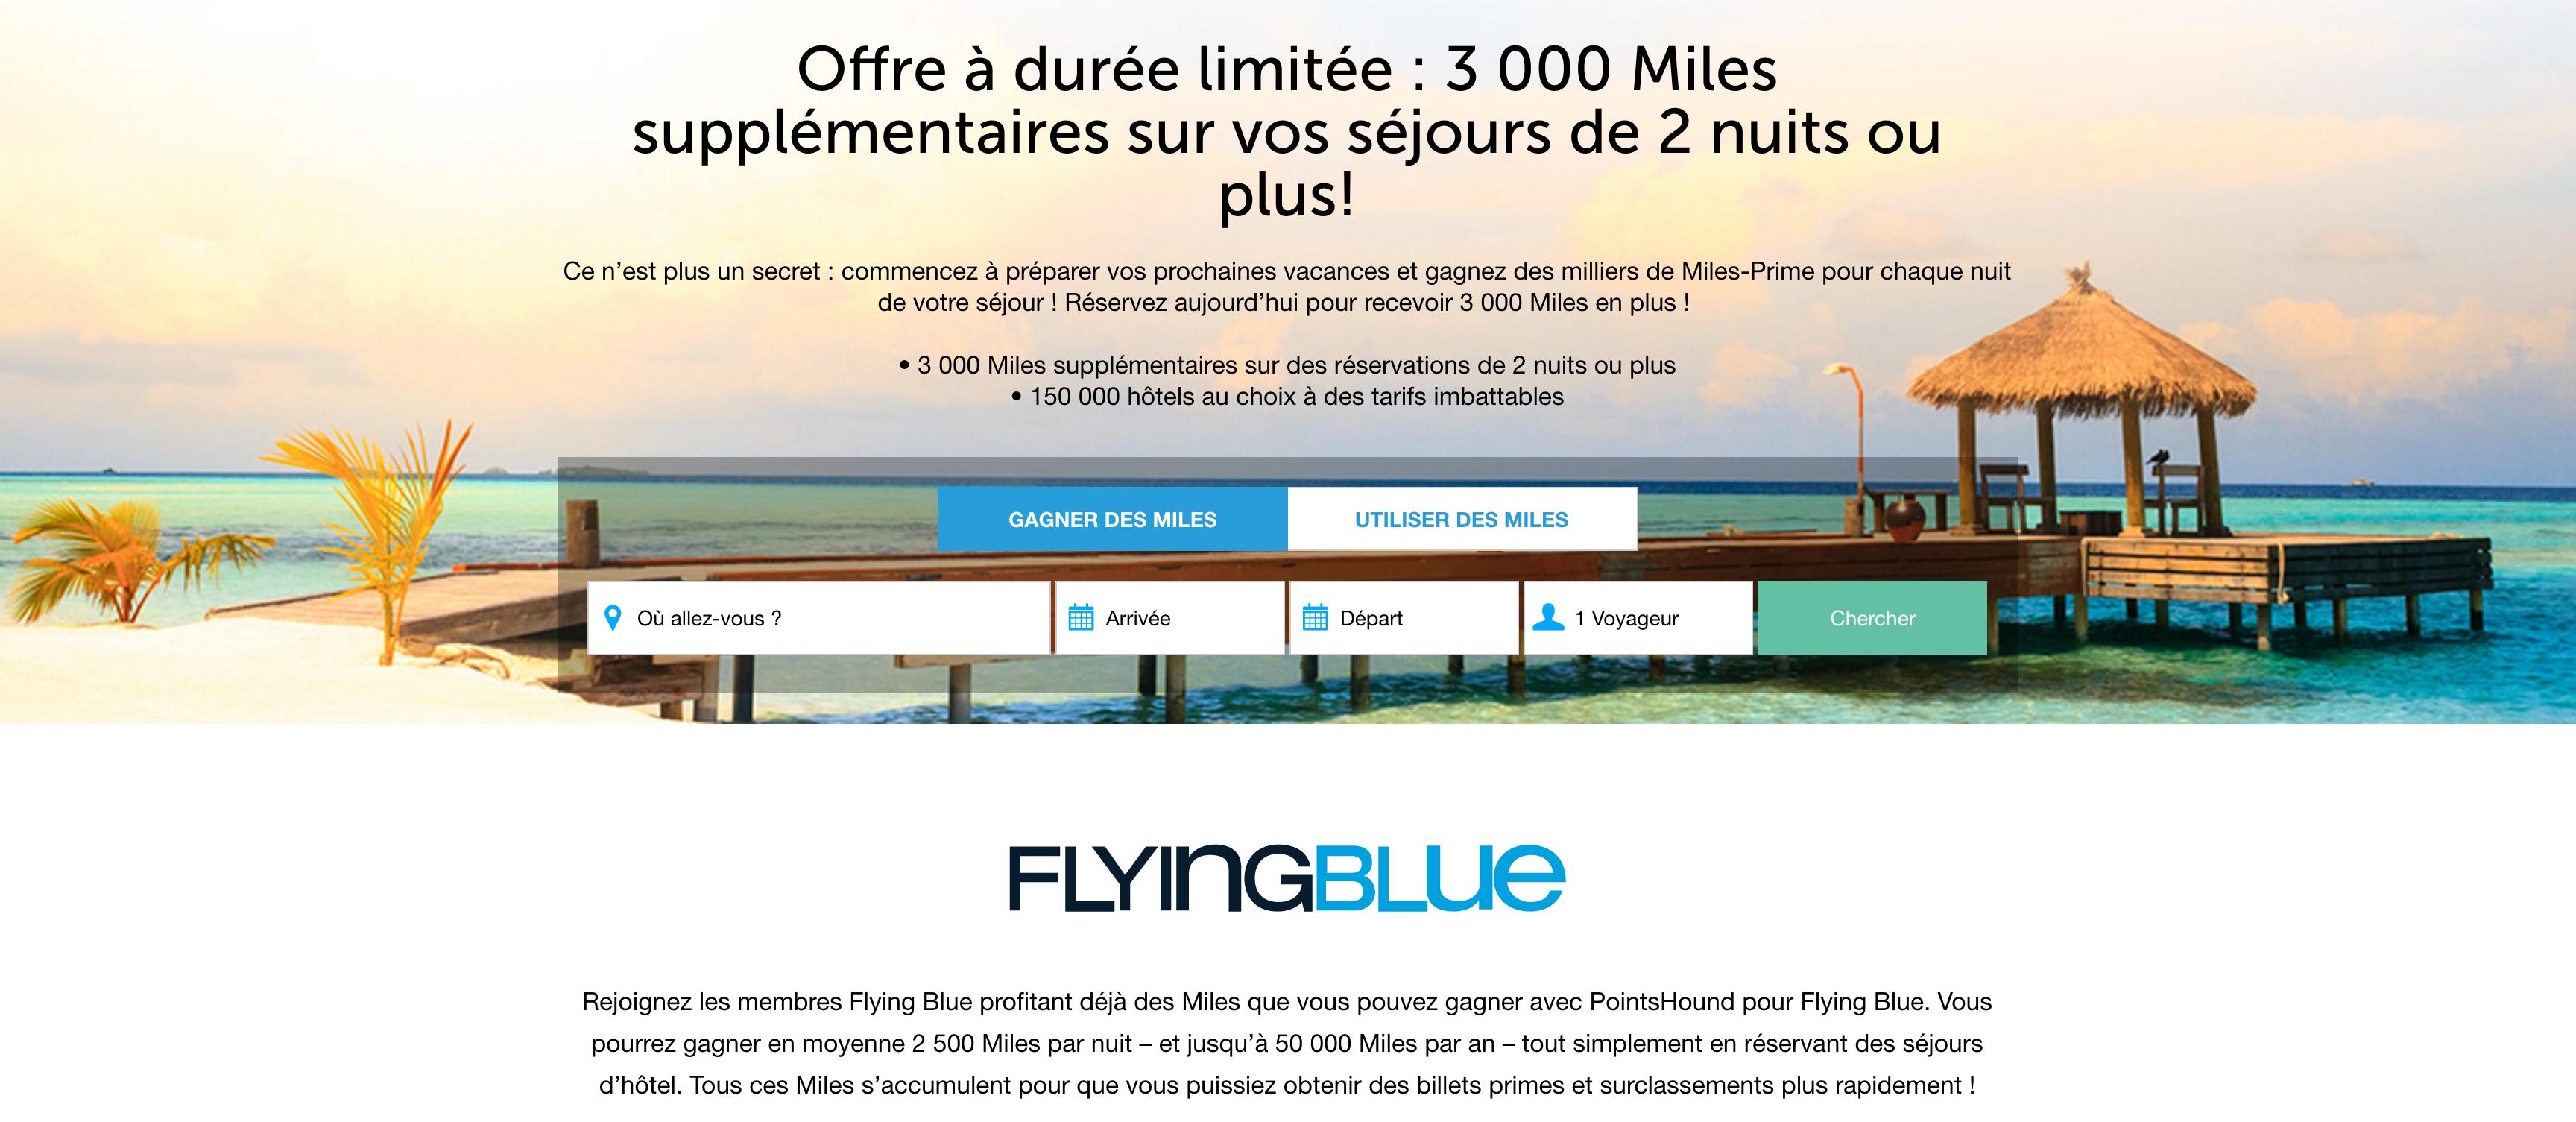 PointsHound、エールフランス航空(AF)/KLMオランダ航空(KL)のFlying Blue獲得キャンペーン(2017/5/31まで)